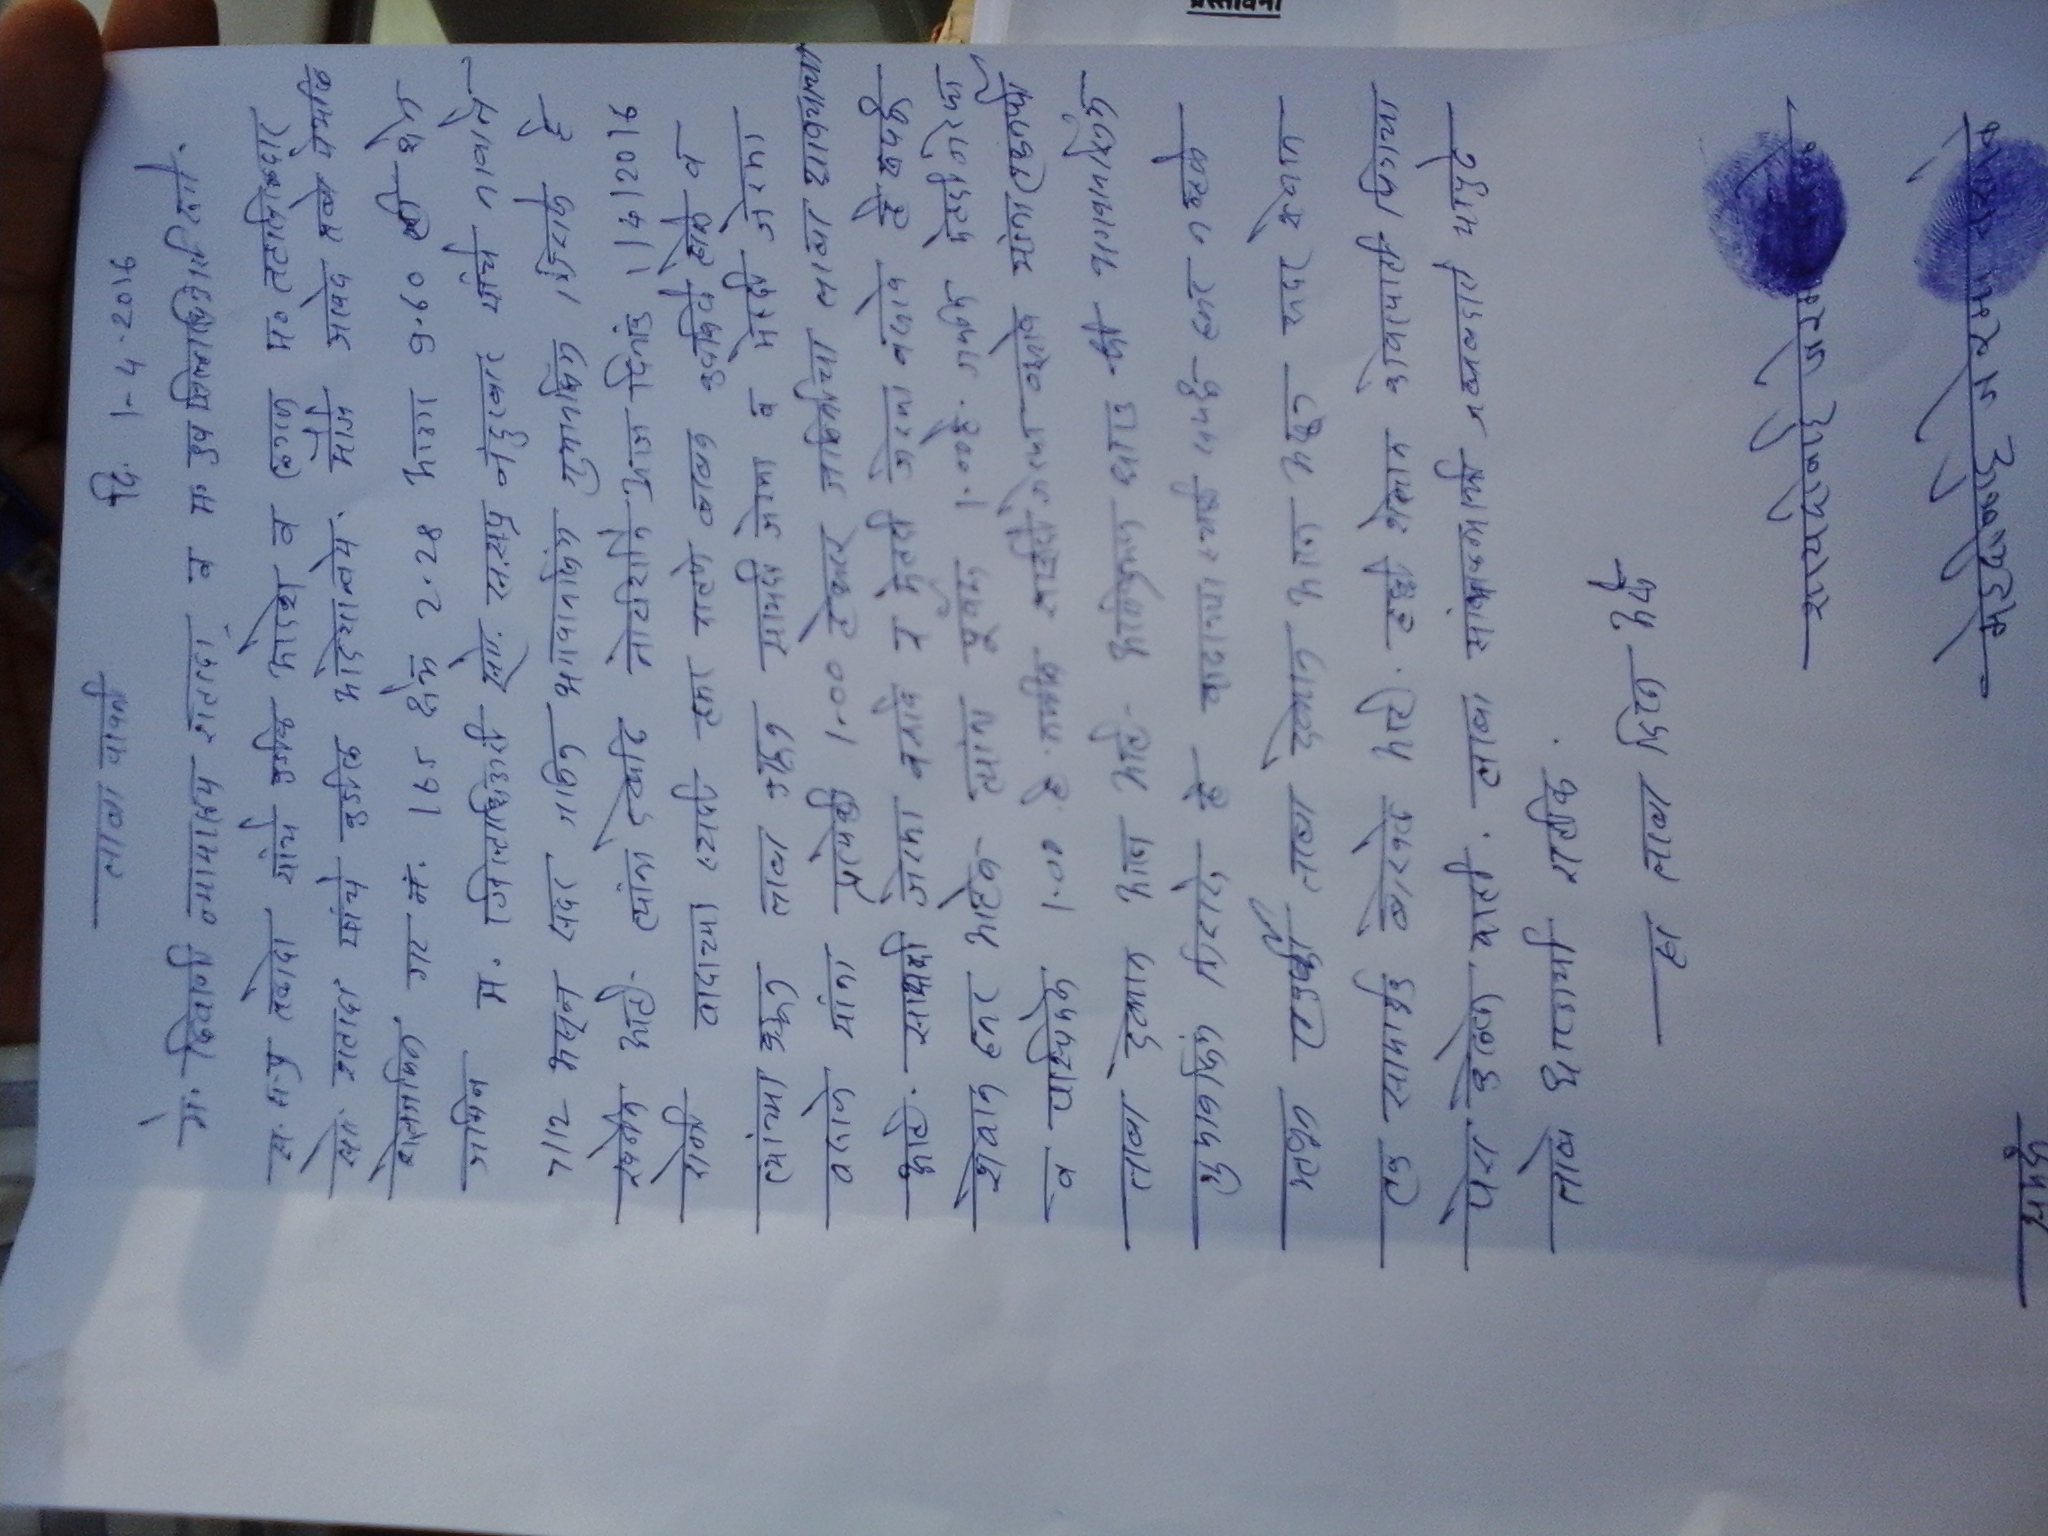 SSP Affected Adivasis get land for land in Nandurbar after three decades